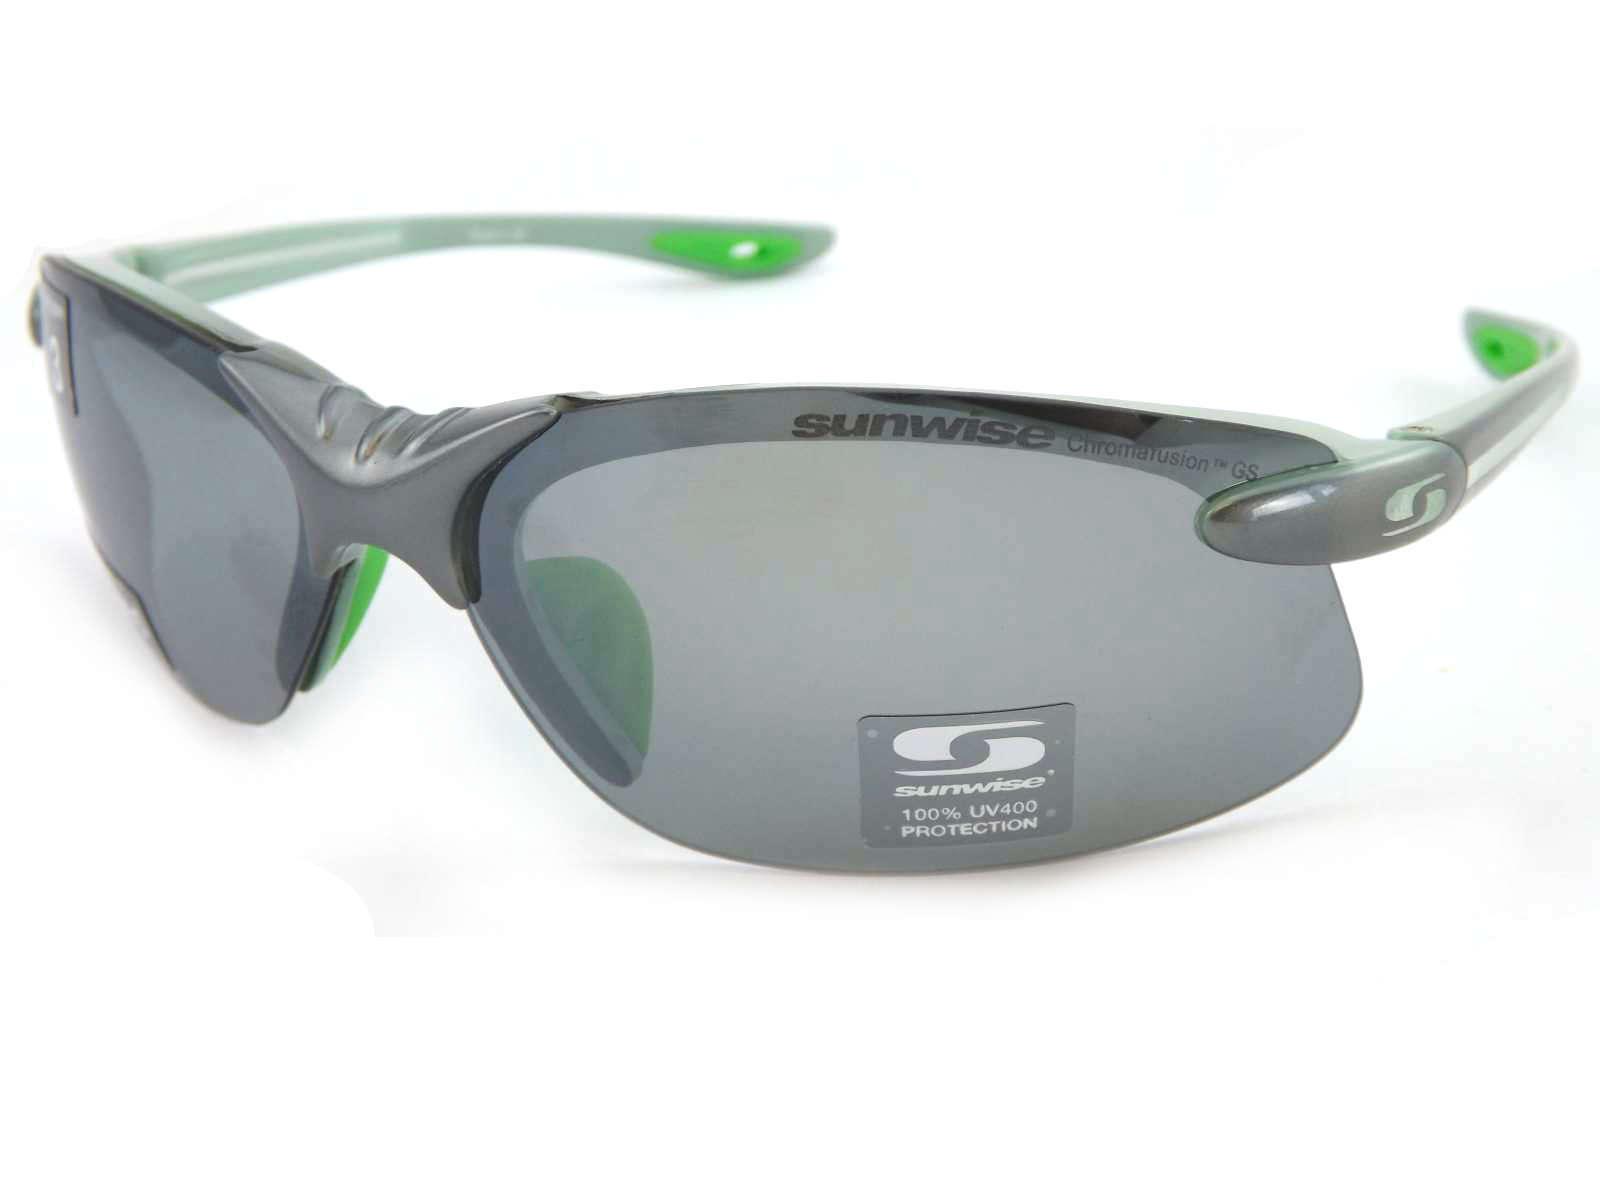 SUNWISE Photochromic WATERLOO grau Sunglasses Light Sensitive grau | Hohe Qualität Und Geringen Overhead